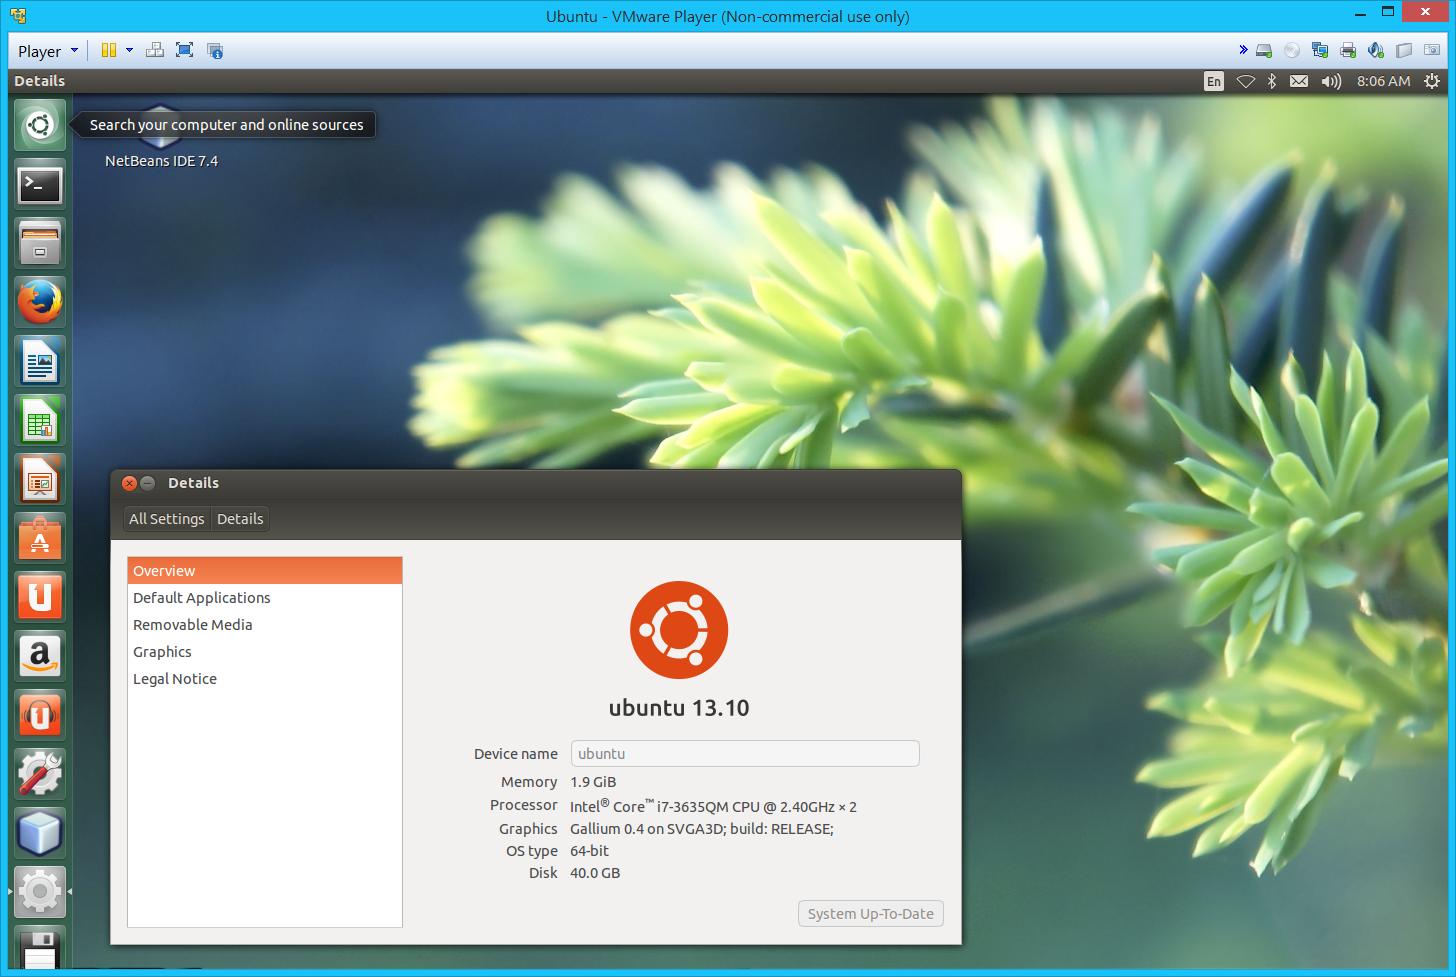 VMware Player v6.0.3 Update Terbaru Juli 2014. vmware player with crack.